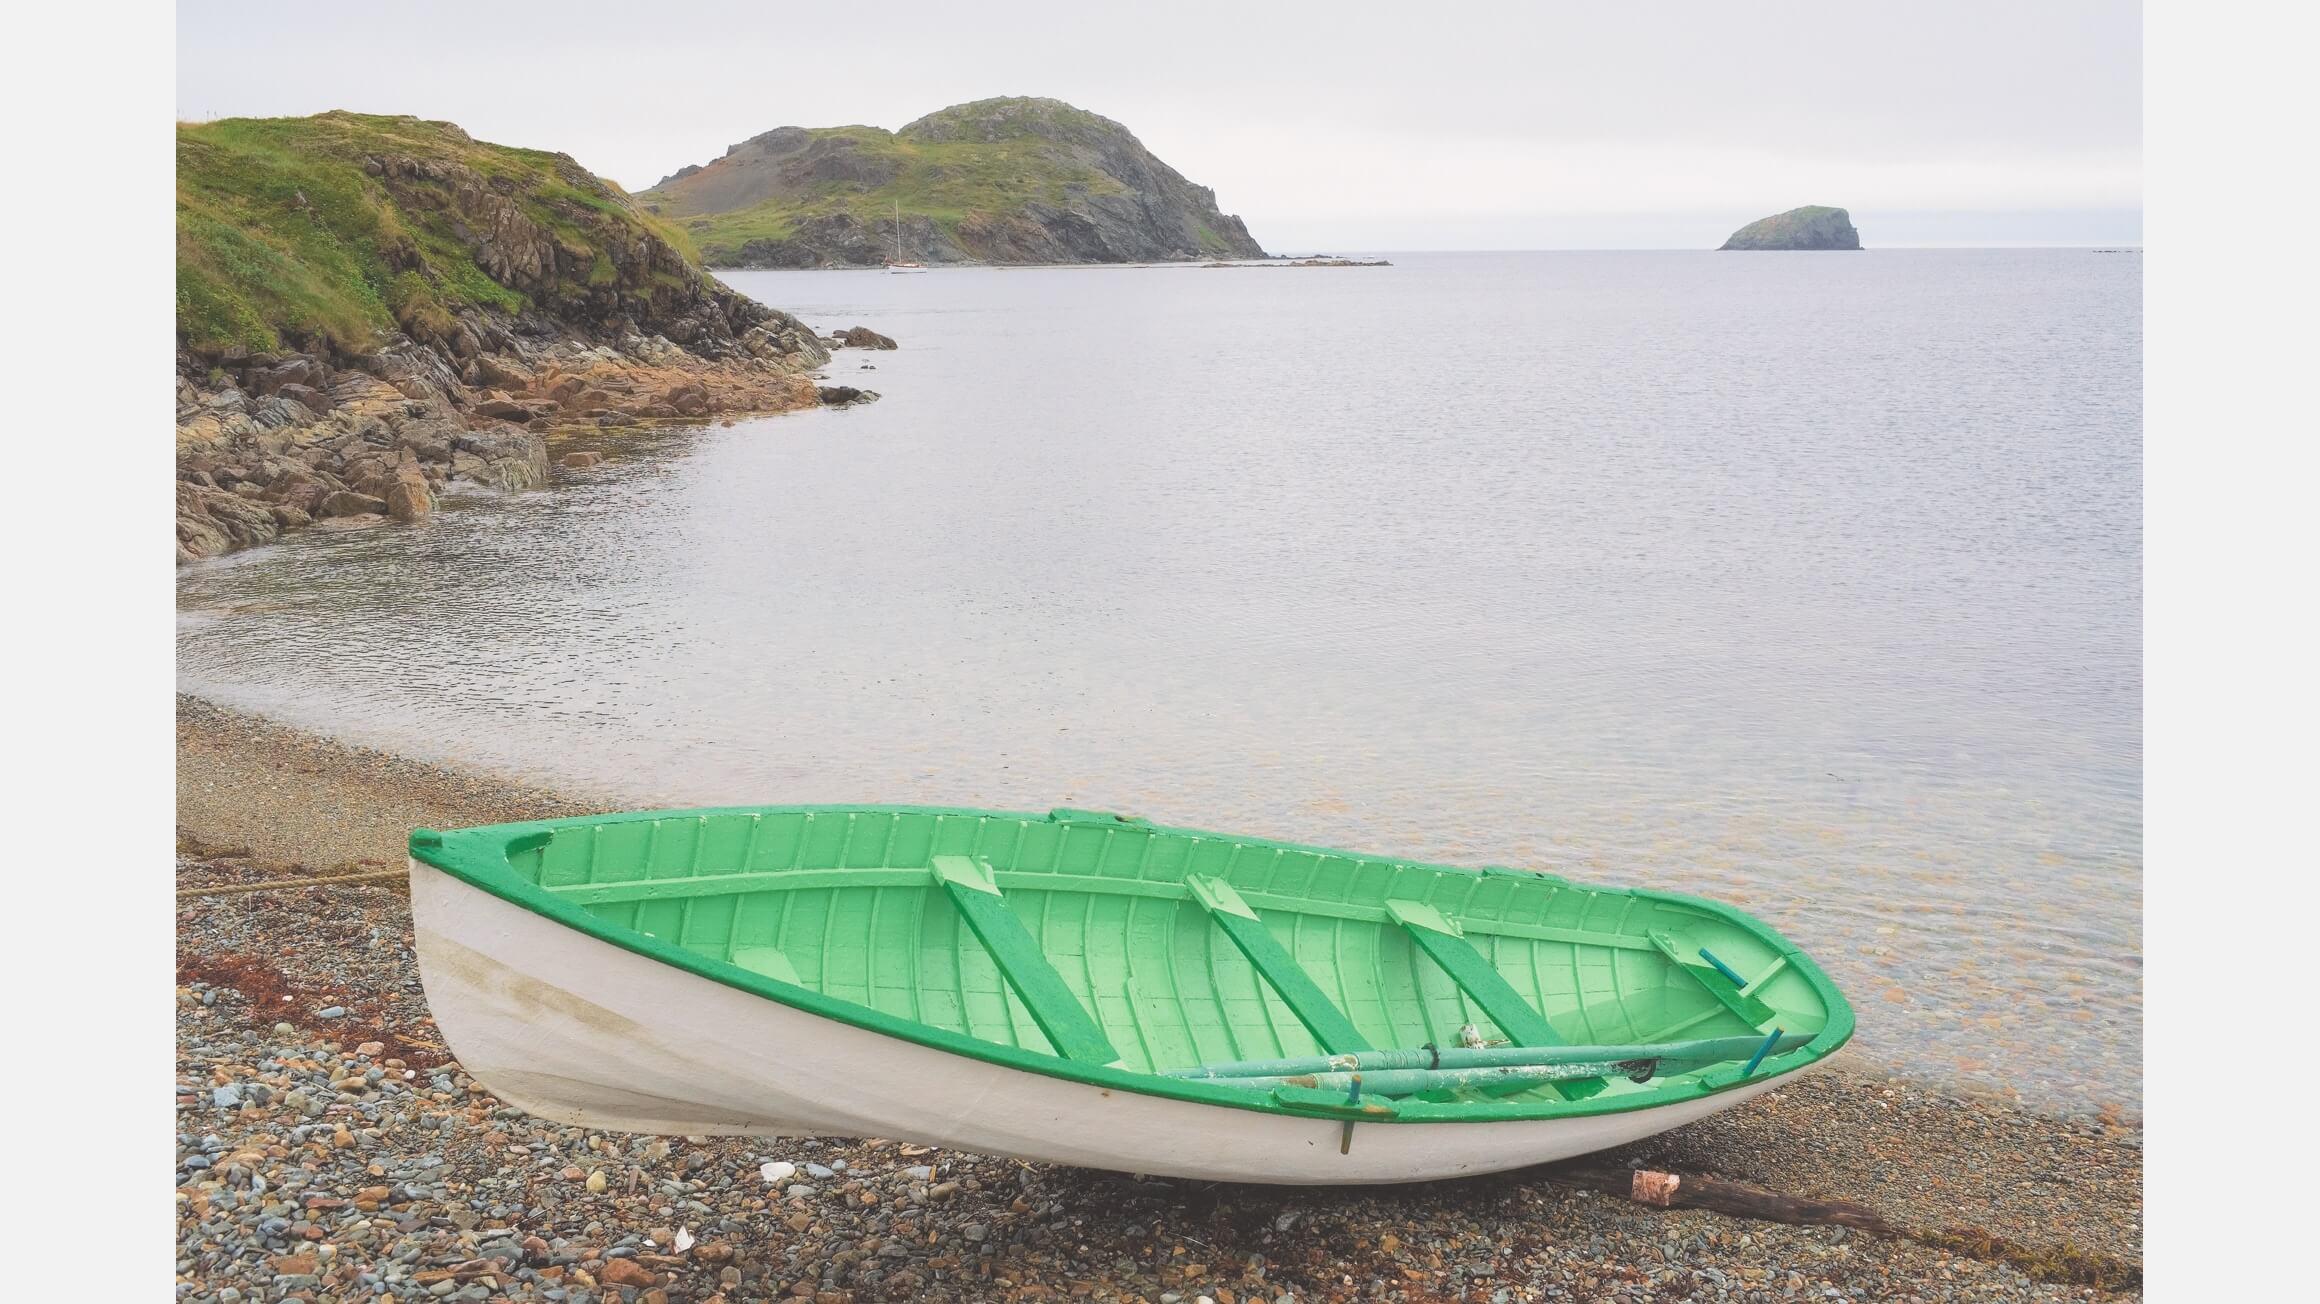 Newfoundland, 2006–8, by Richard Benson